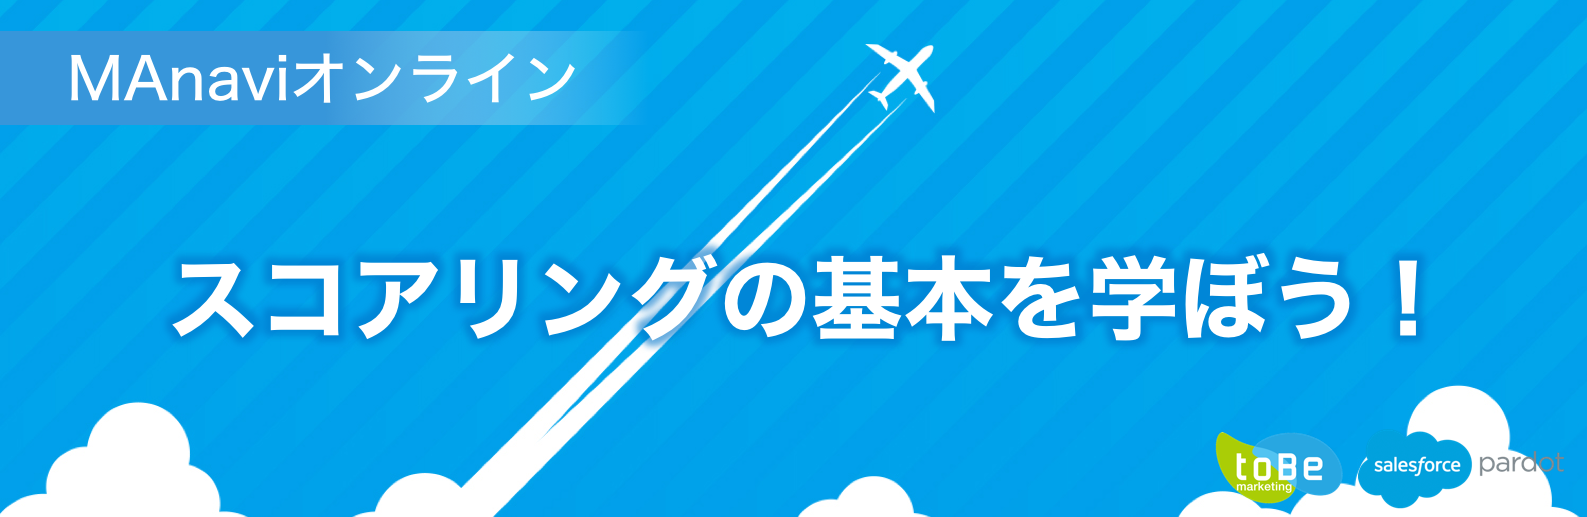 【MAnaviオンライン】スコアリングの基本を学ぼう!